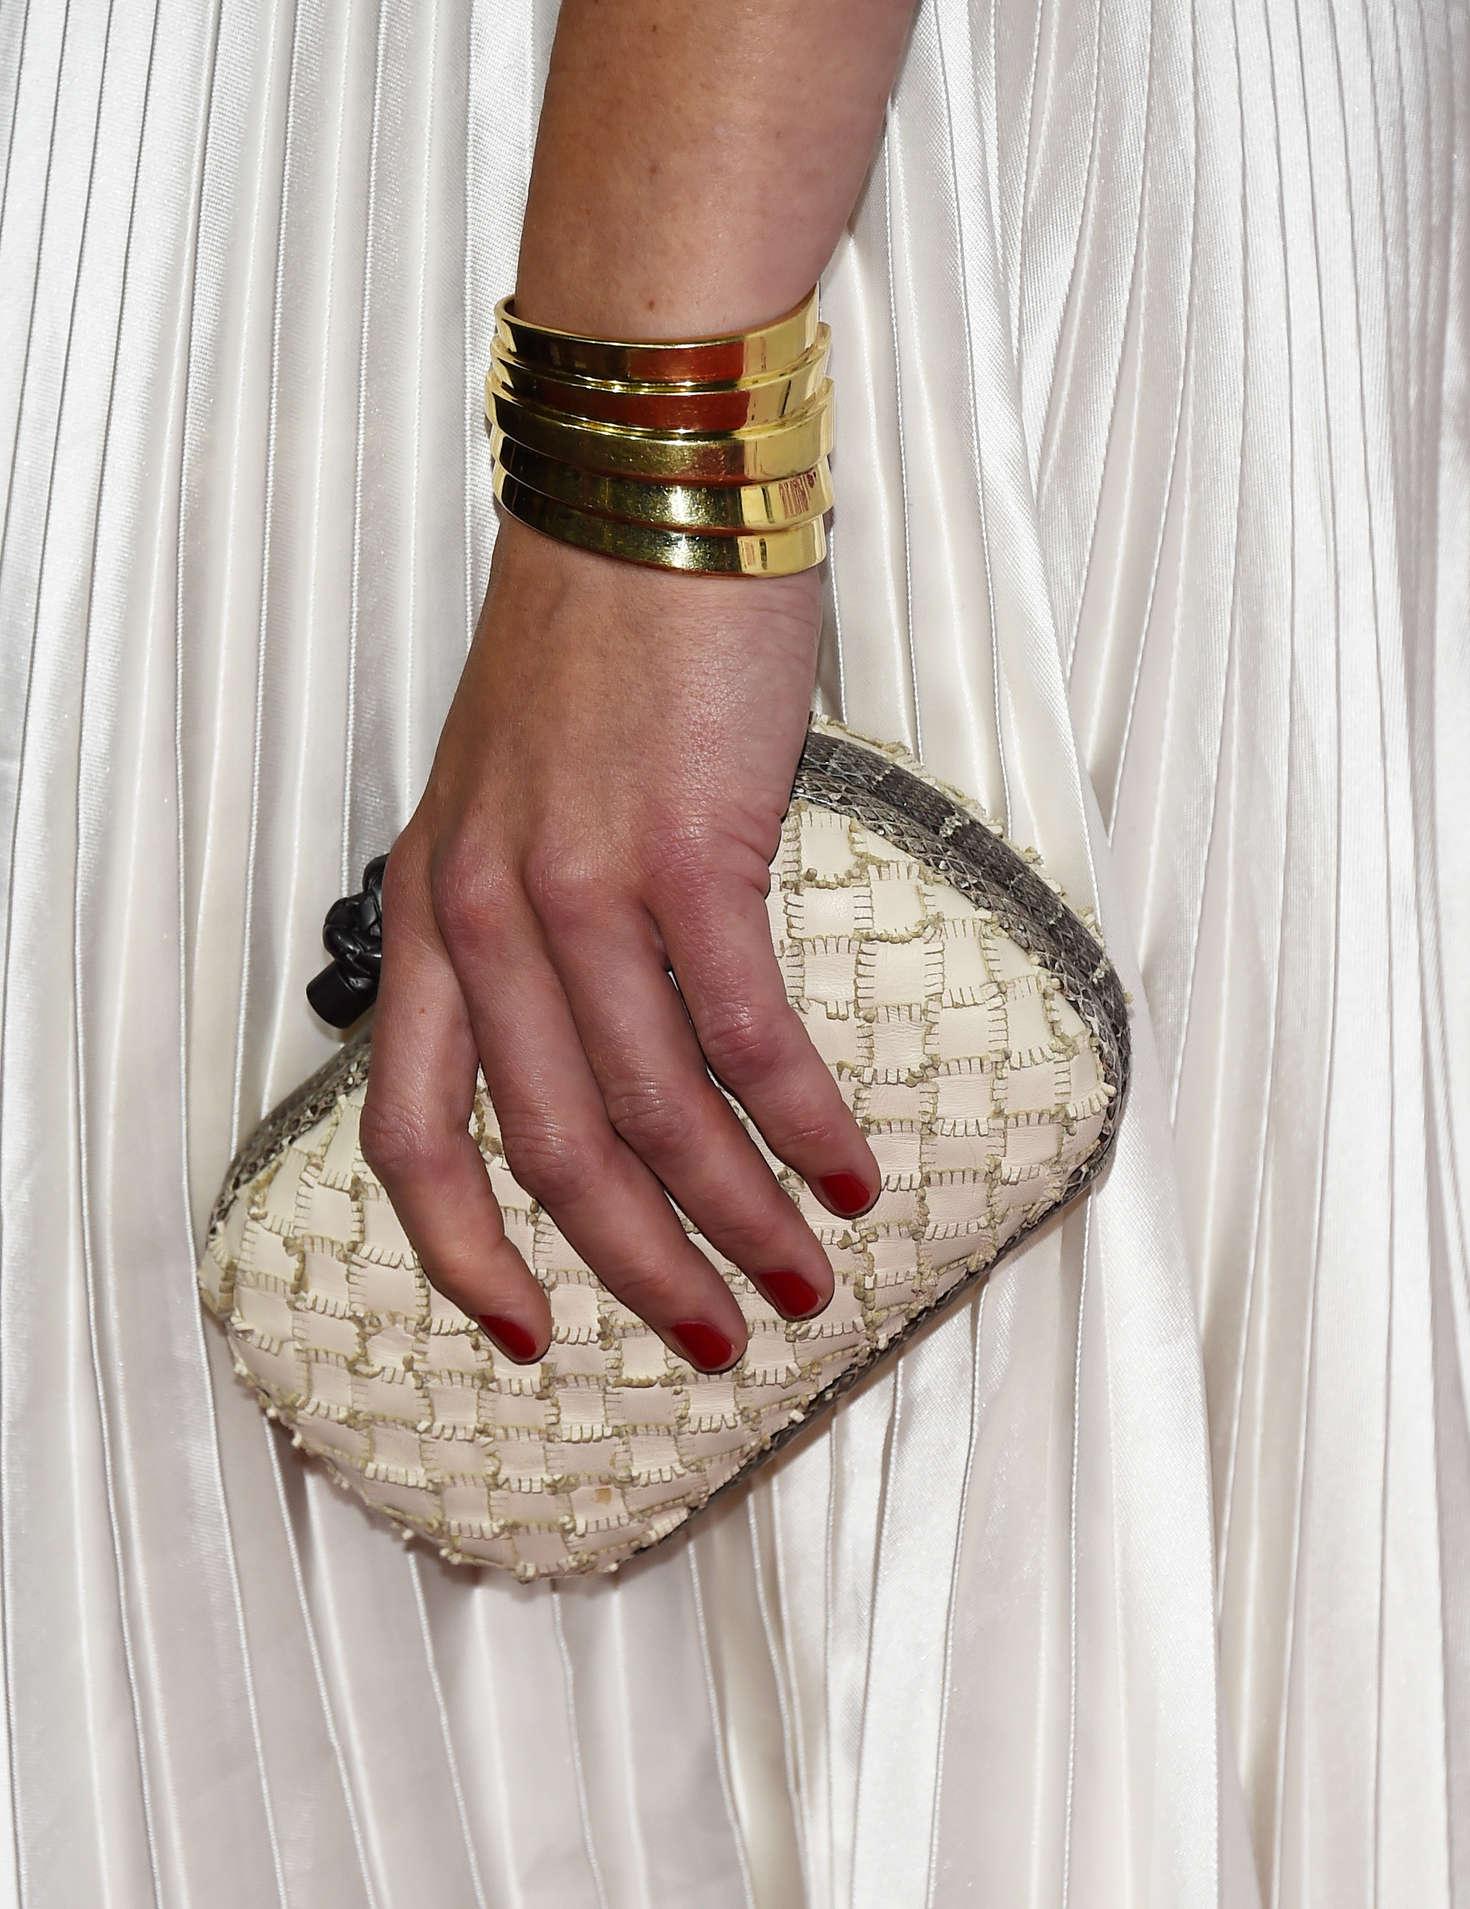 Aimee Teegarden 2016 : Aimee Teegarden: Notorious LA Premiere -20